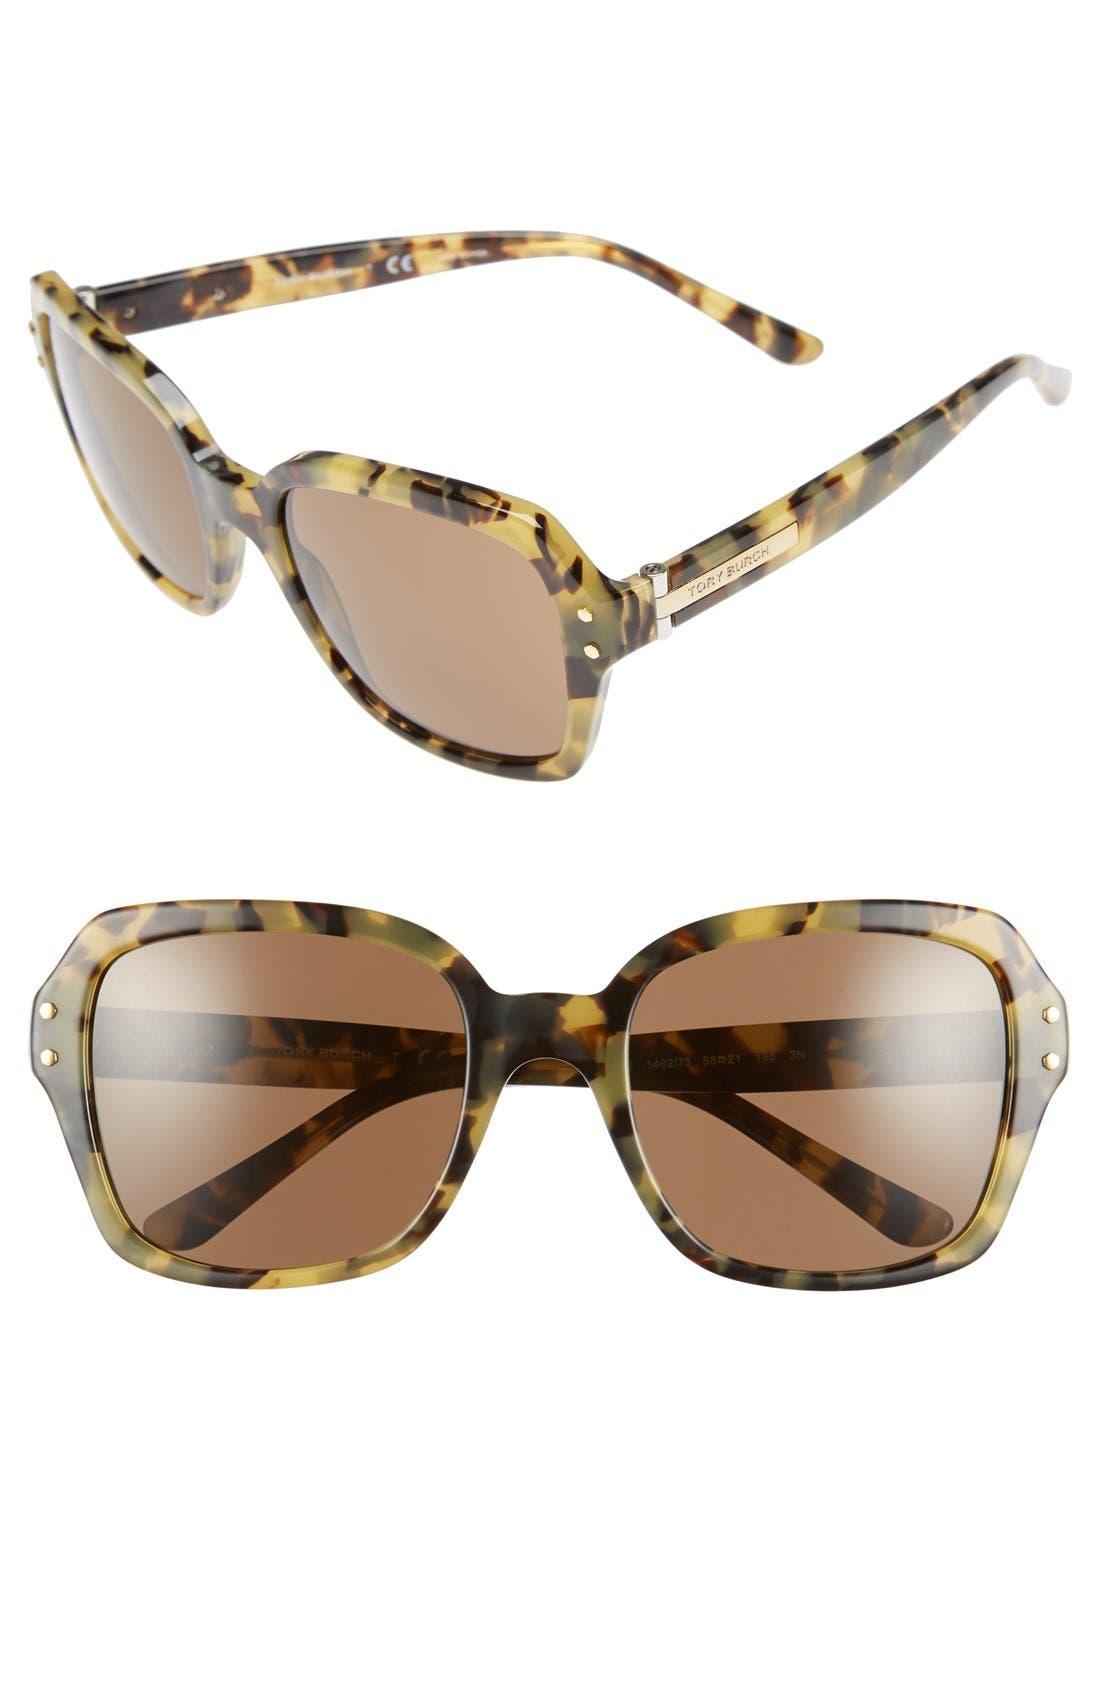 Alternate Image 1 Selected - Tory Burch 55mm Retro Sunglasses